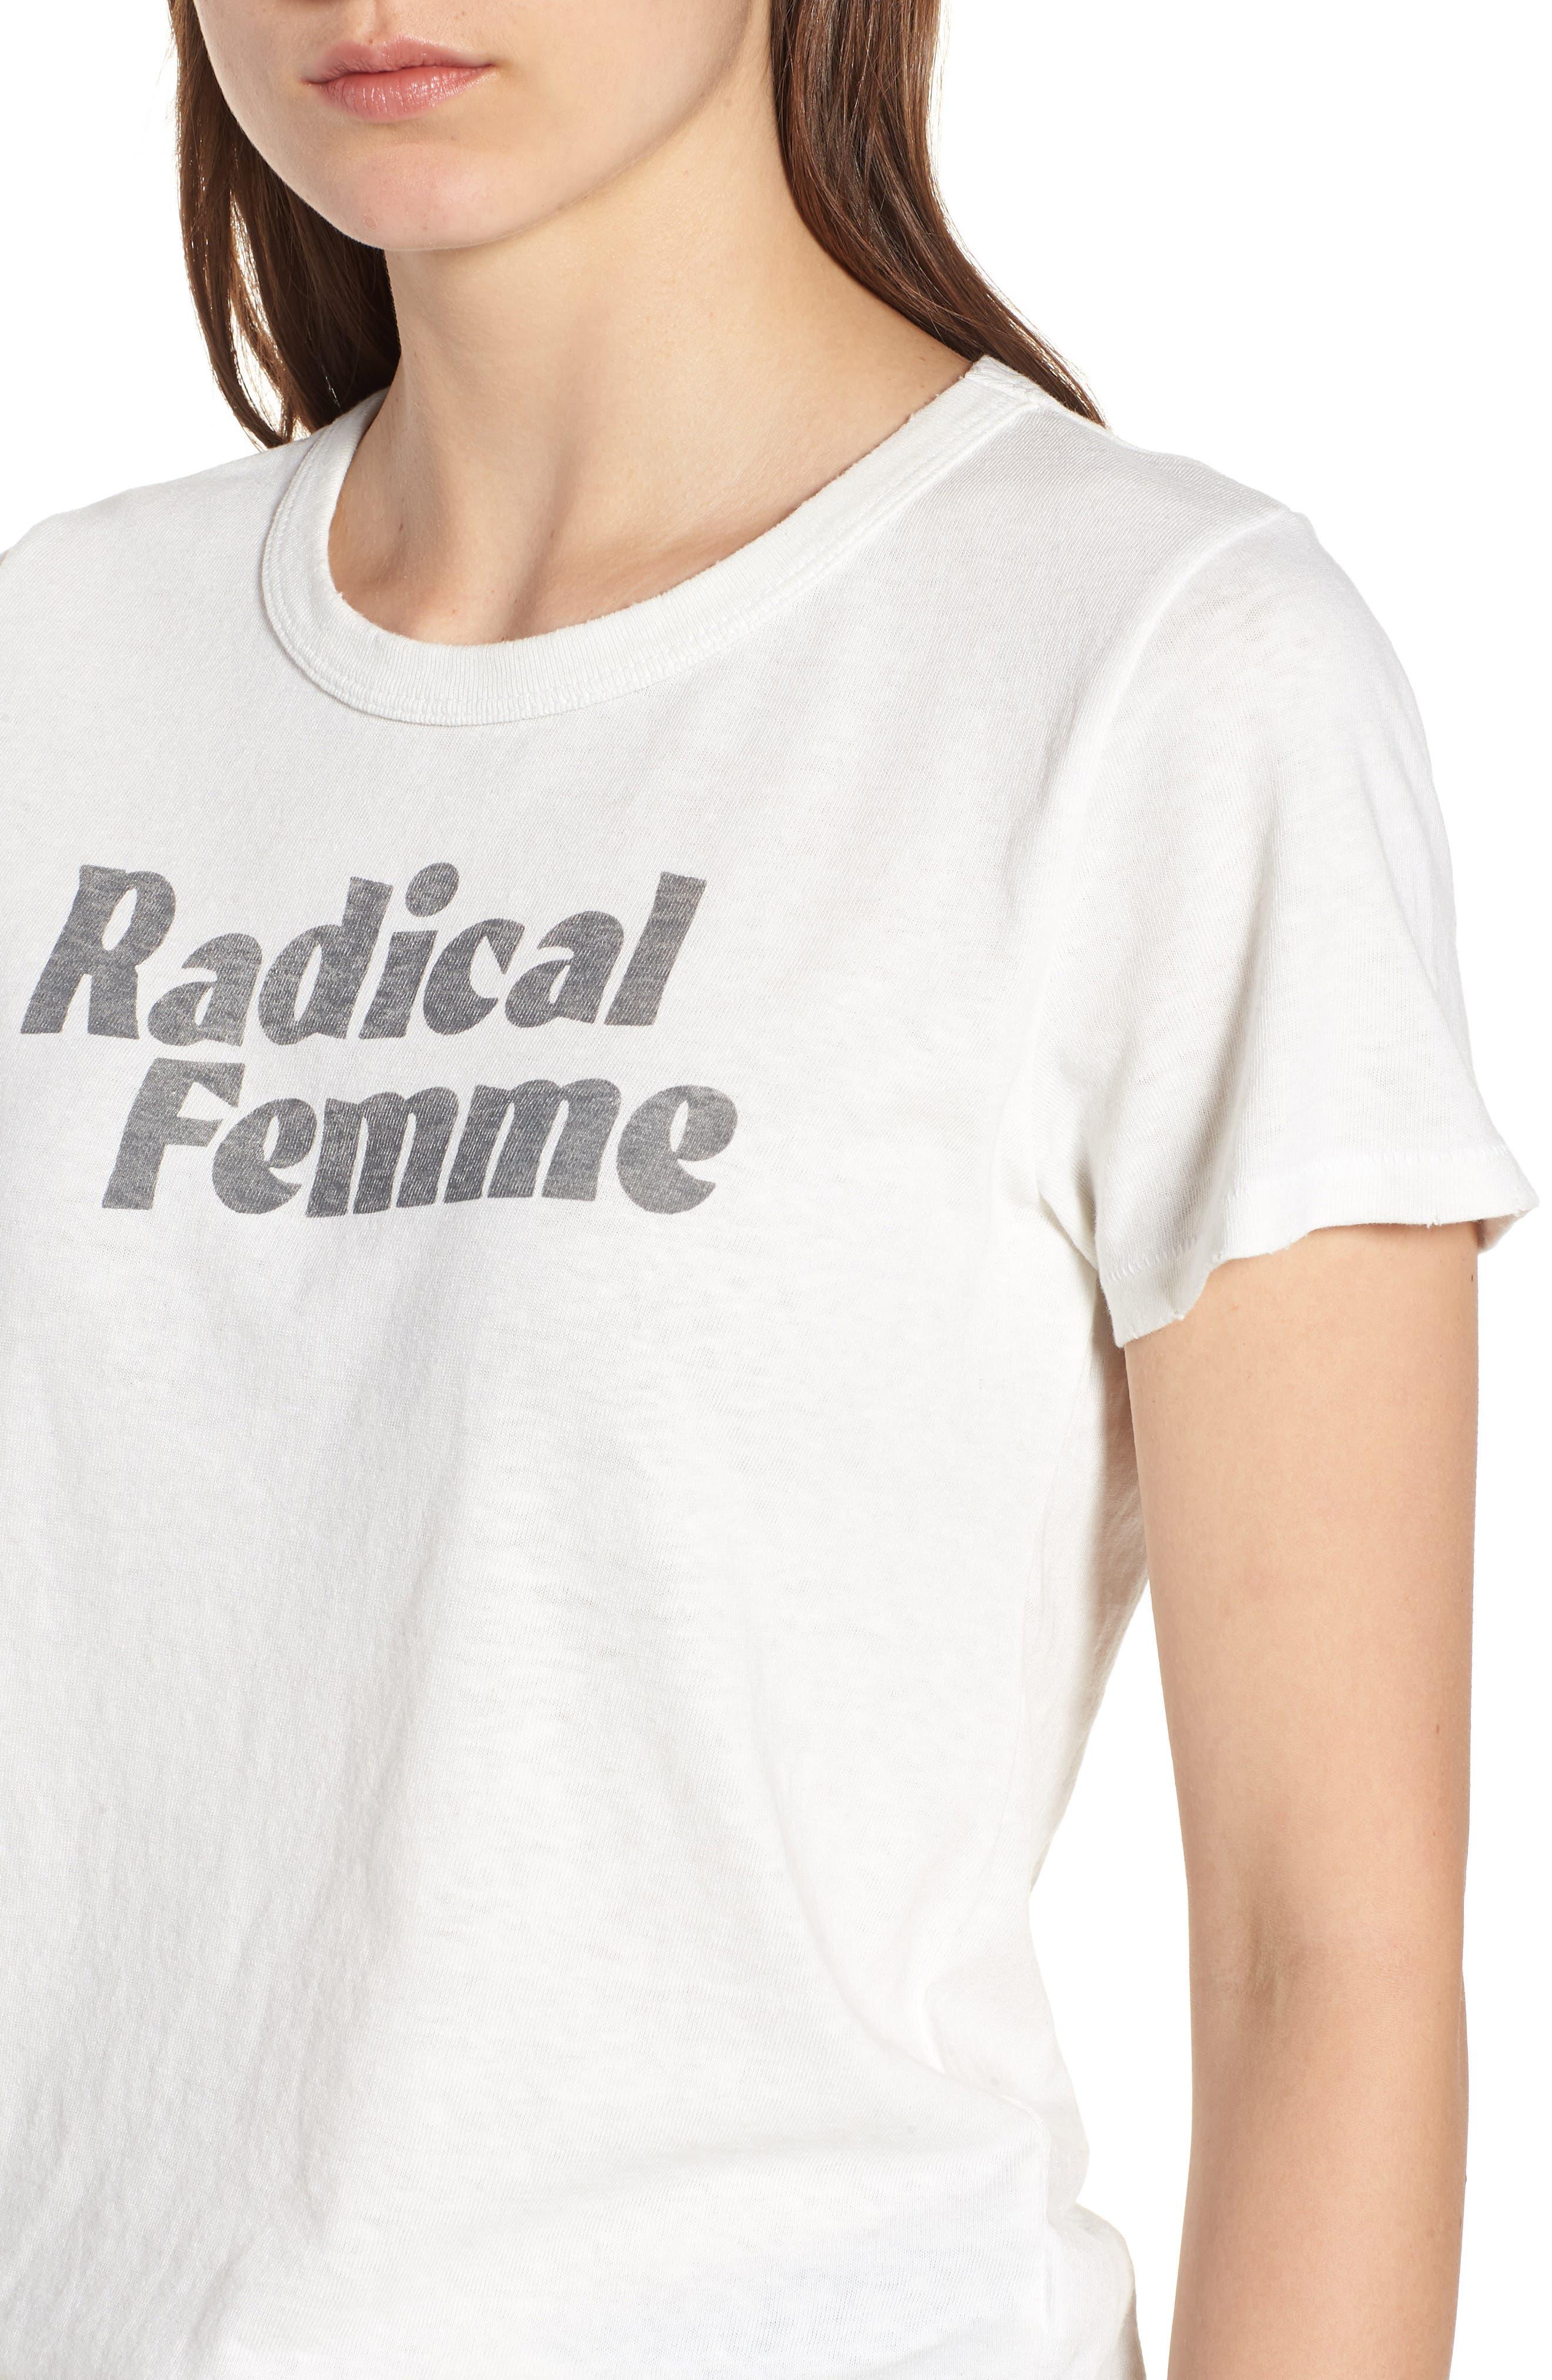 Radical Femme Tee,                             Alternate thumbnail 4, color,